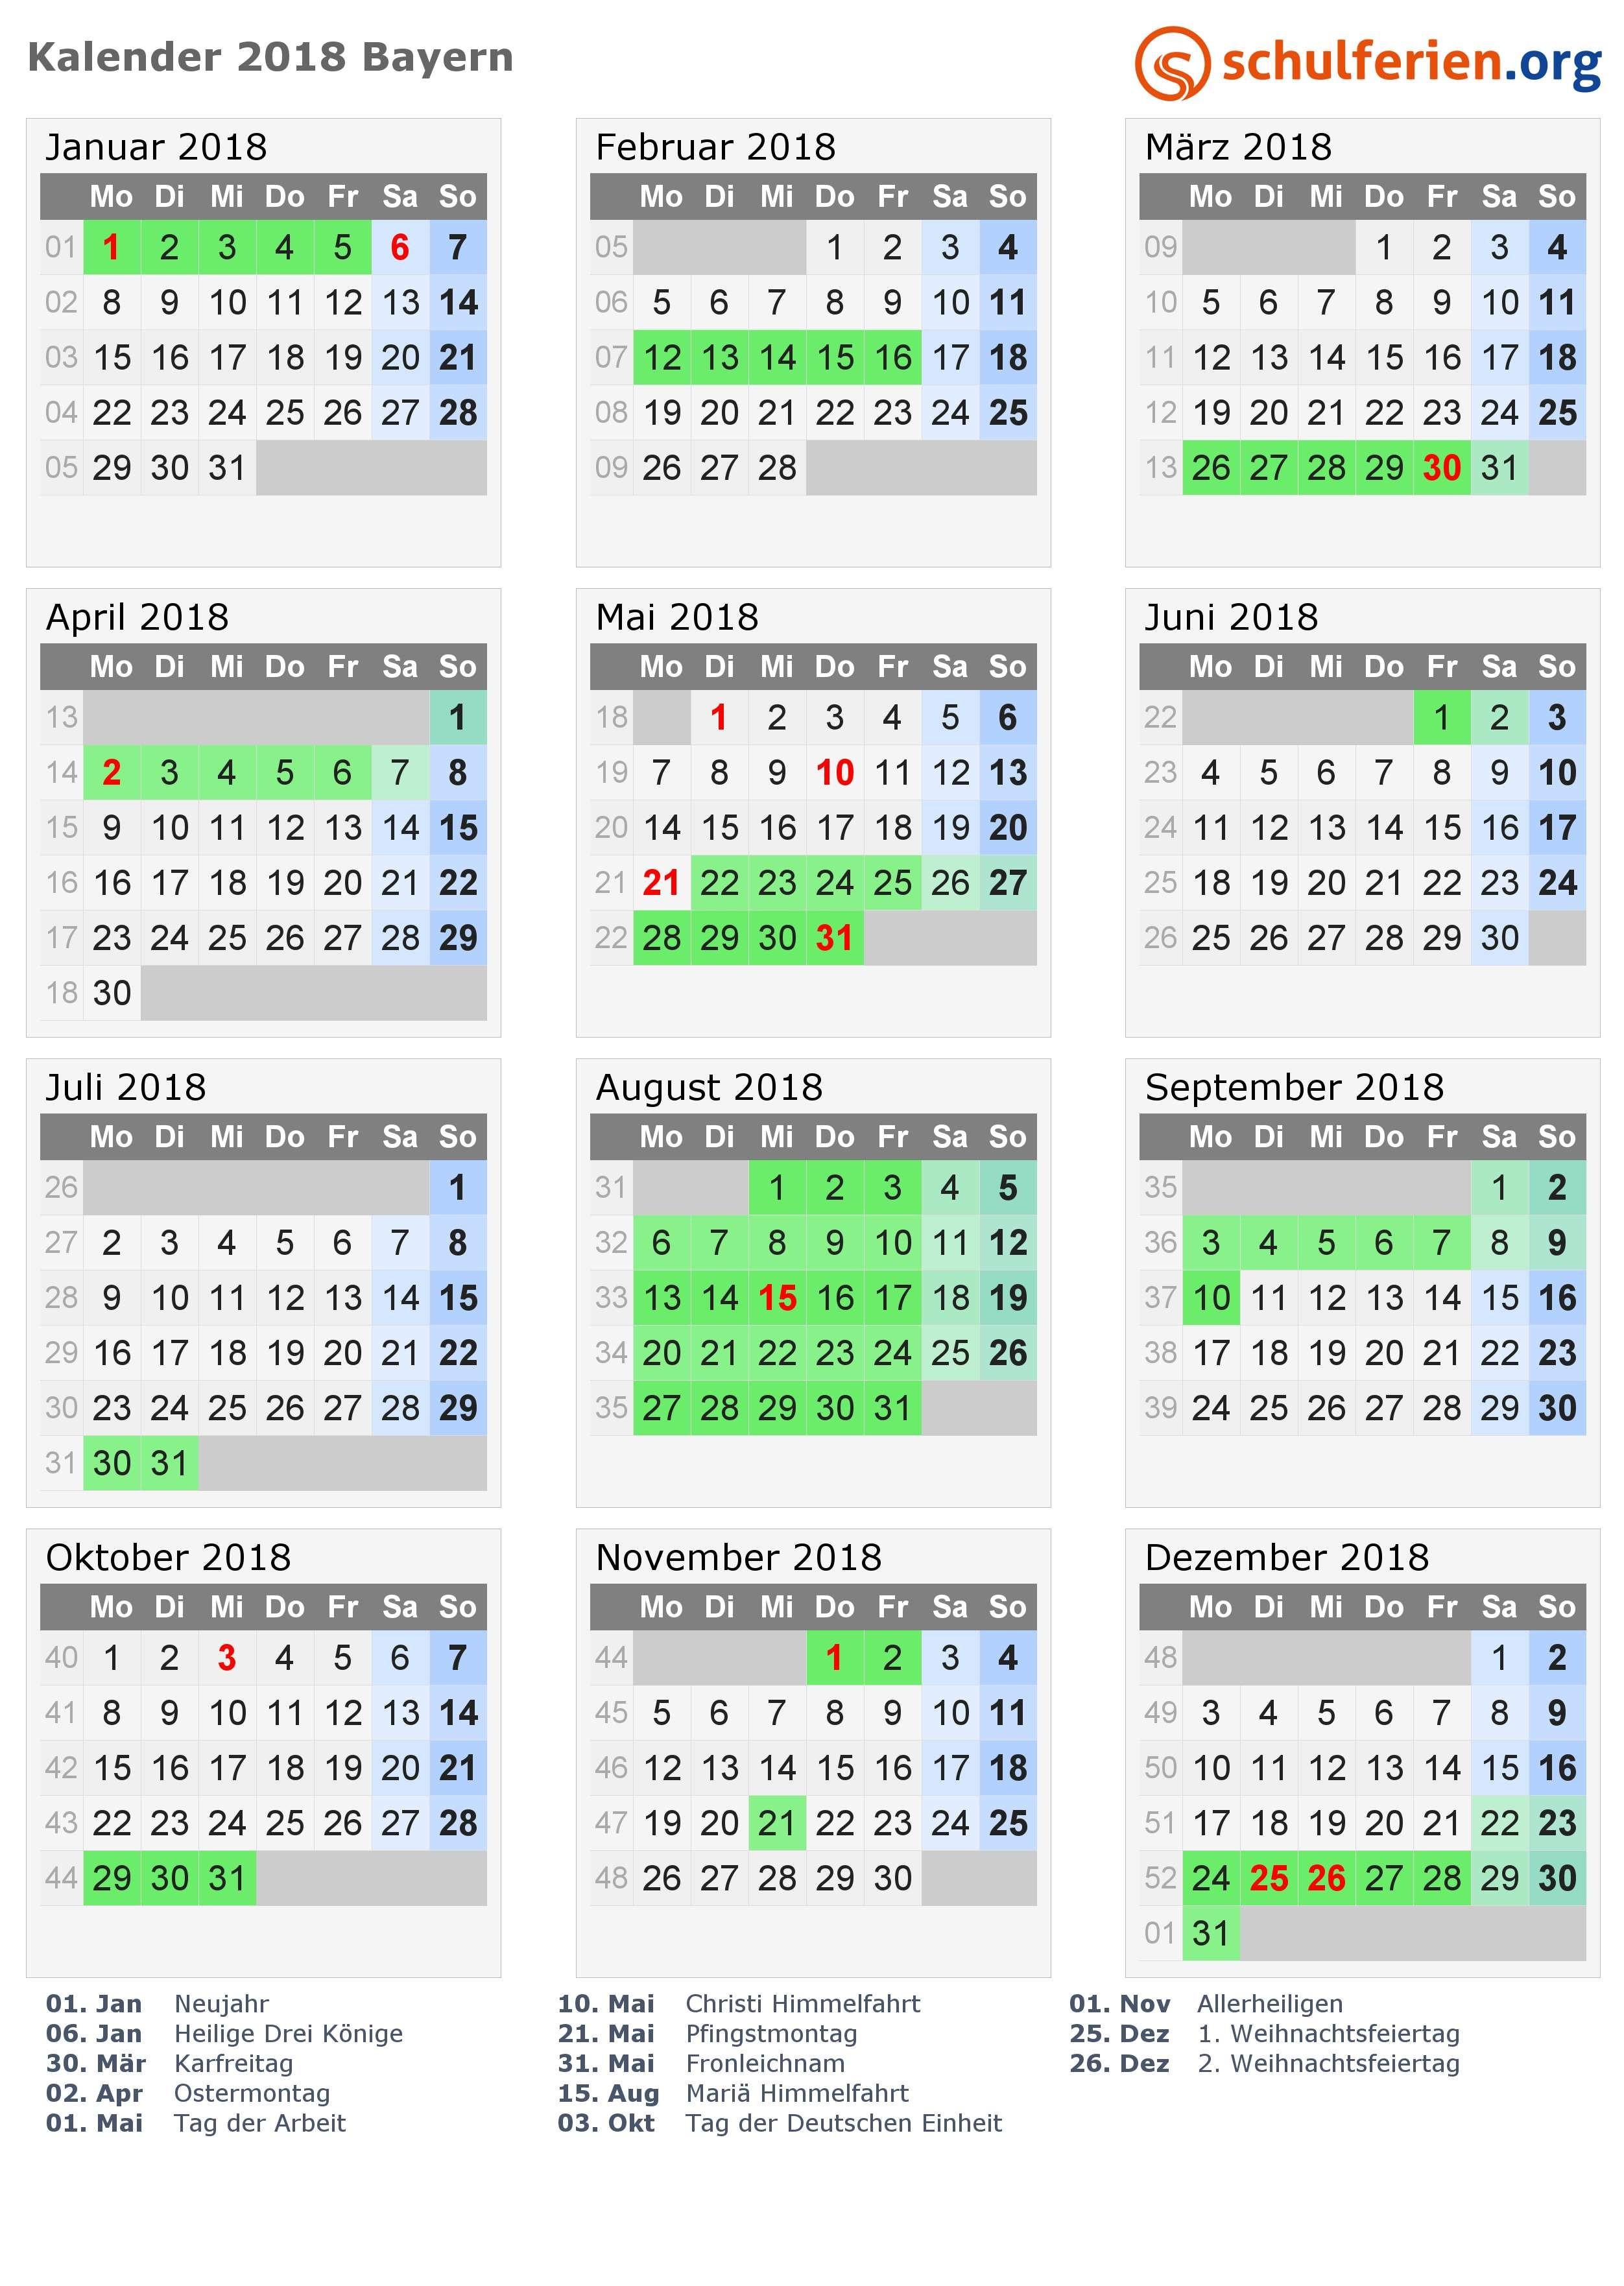 Kalender 2019 Pdf Hamburg Recientes 32 Elegant Ferien Weihnachten 2017 Grafik Of Kalender 2019 Pdf Hamburg Más Recientes Konstanz Wikiwand